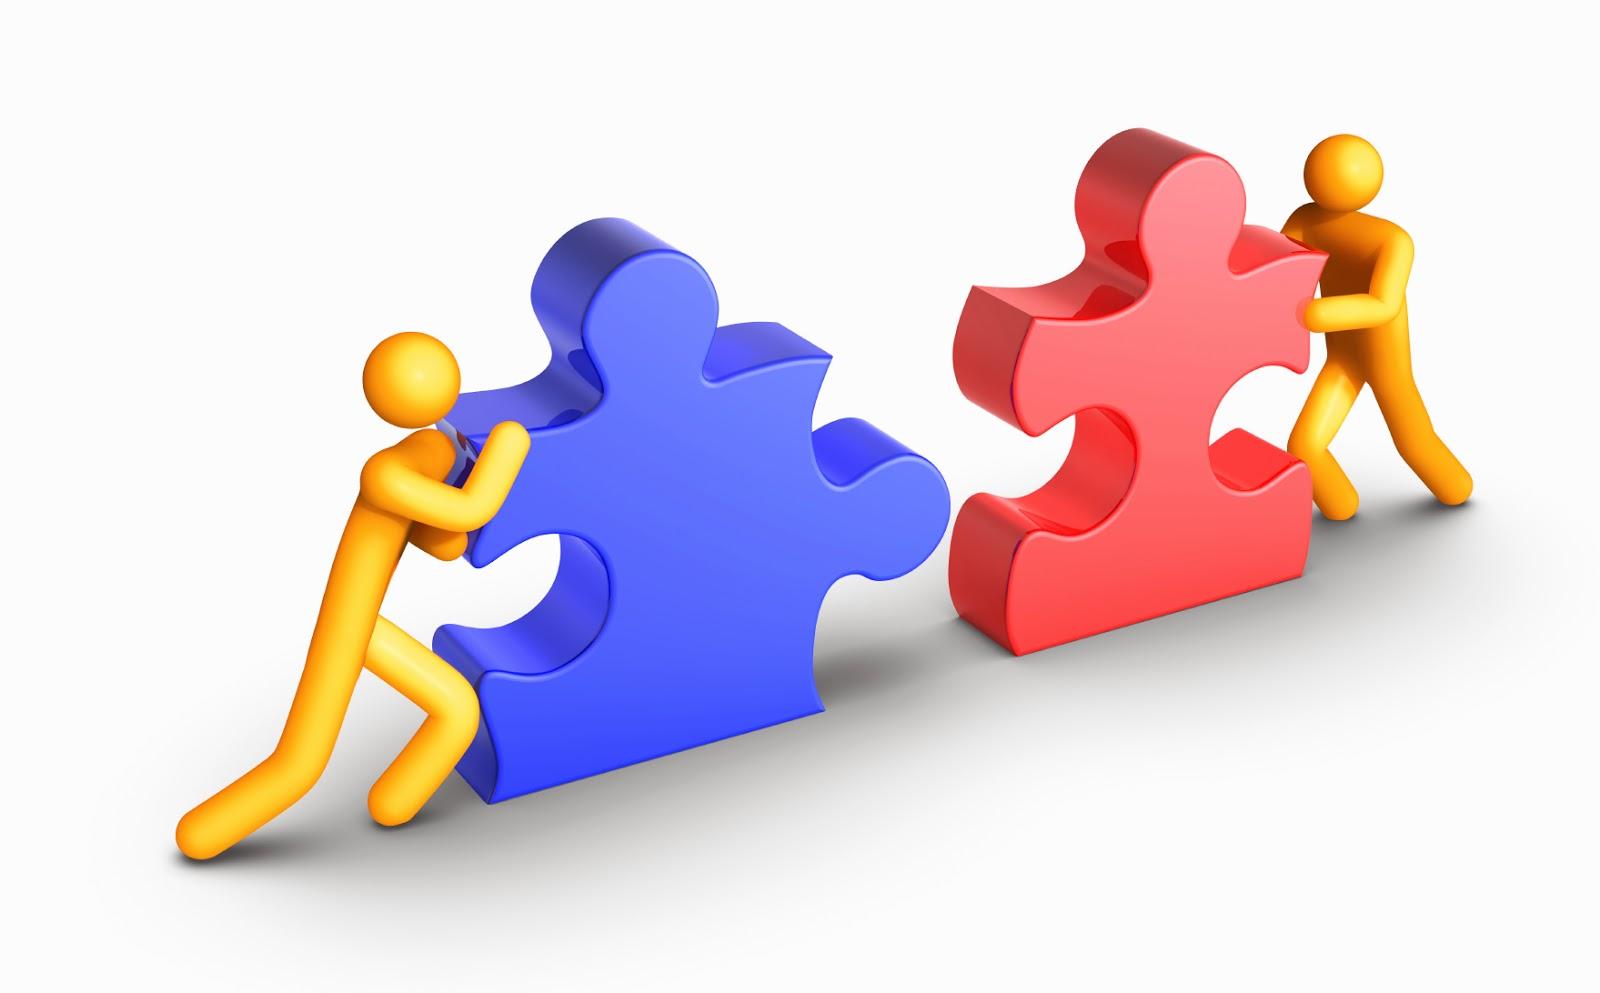 http://2.bp.blogspot.com/-Hjxwtb4Pqn8/Uw_cj5prHGI/AAAAAAAAAcI/JP8pzfa_39k/s1600/collaboration.jpg